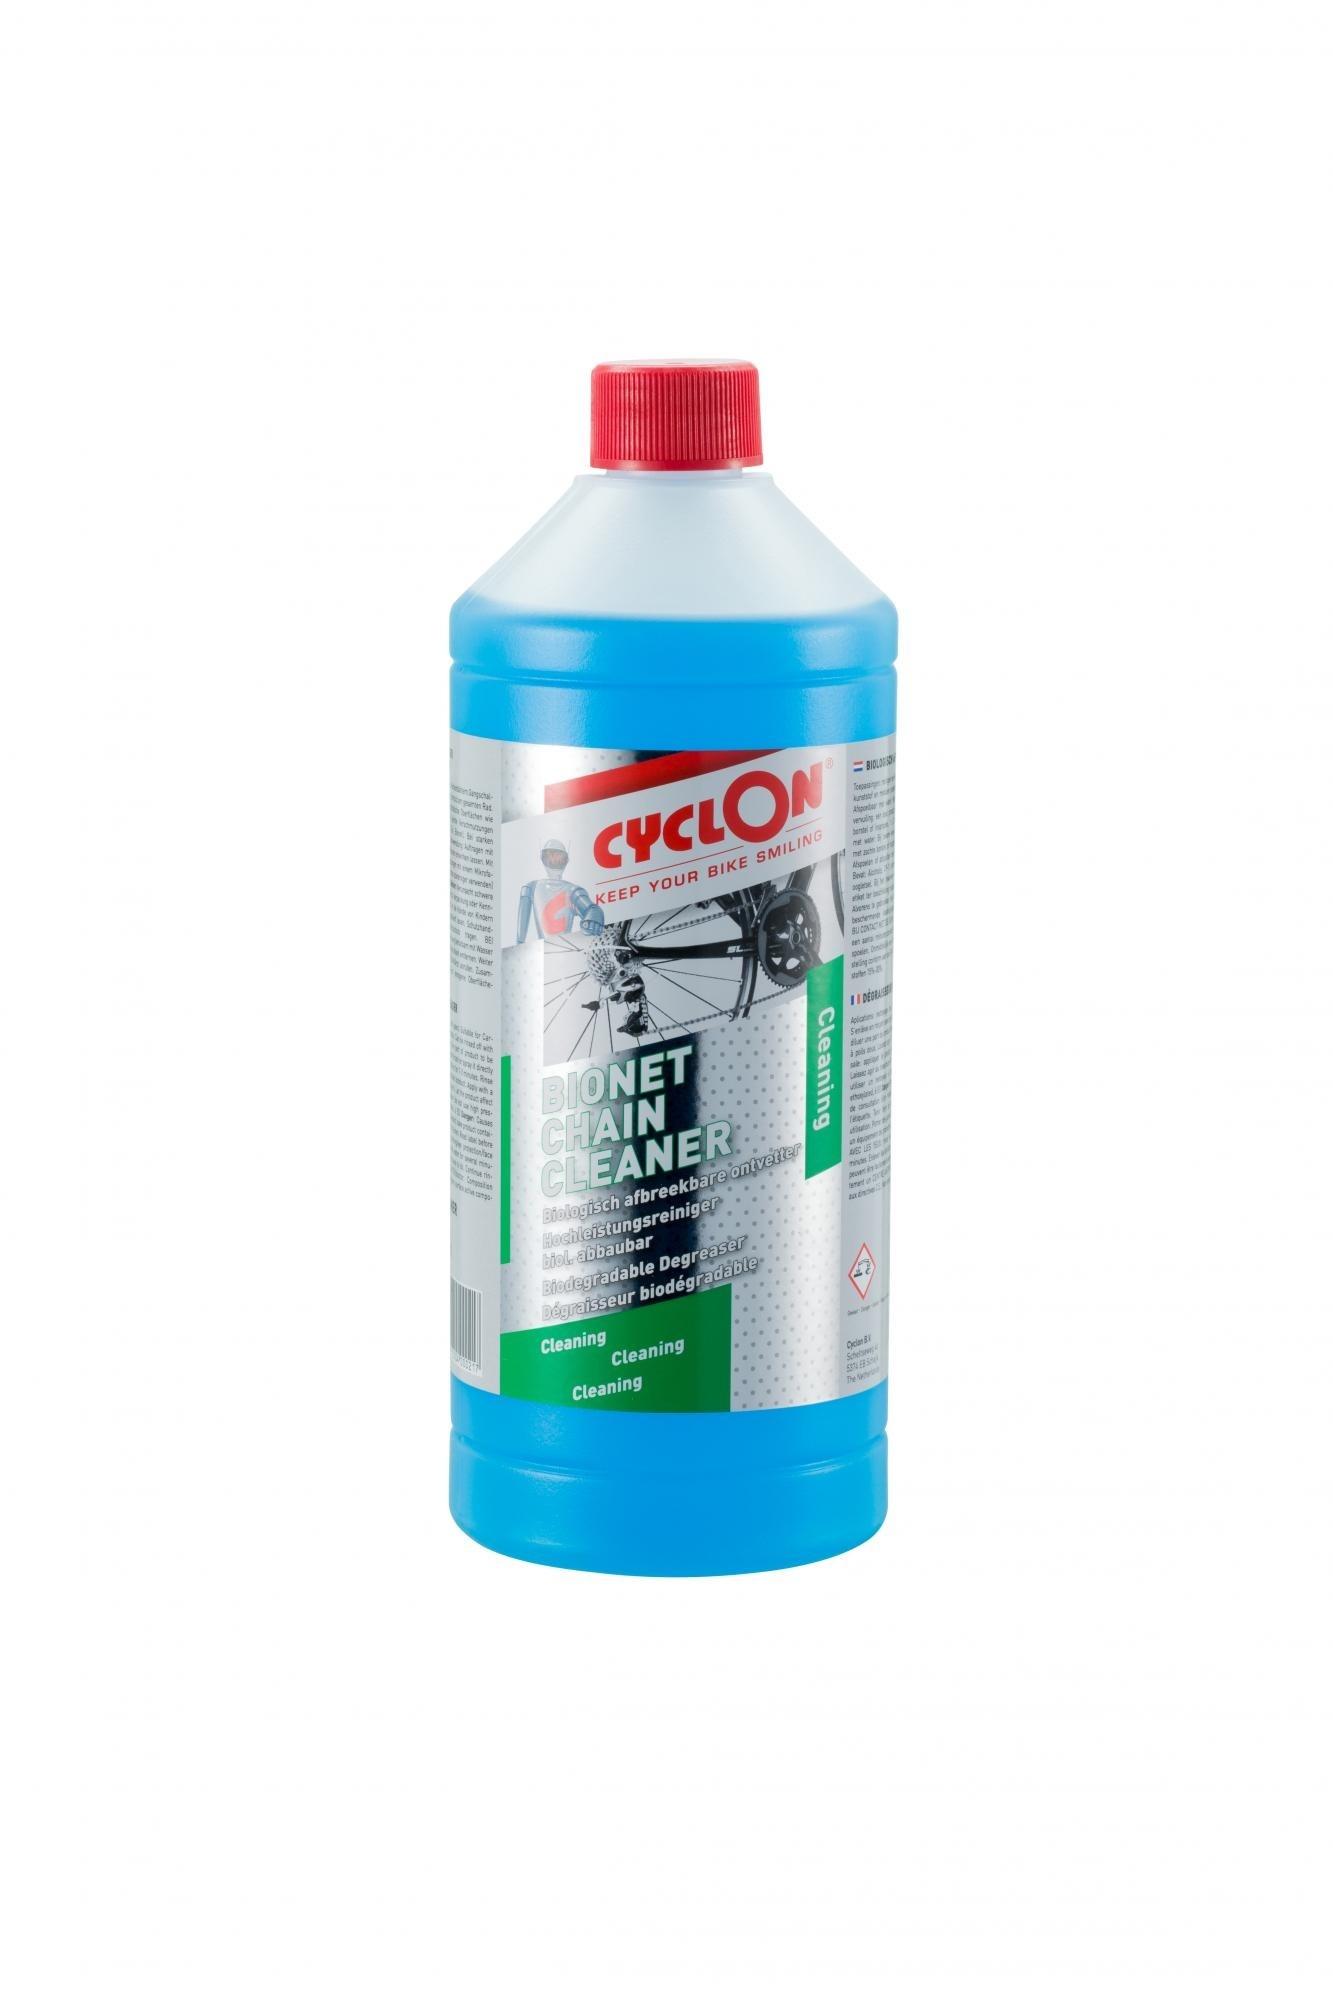 Cyclon Cyclon Bionet Chain Cleaner 1000 ml affedtningsmiddel